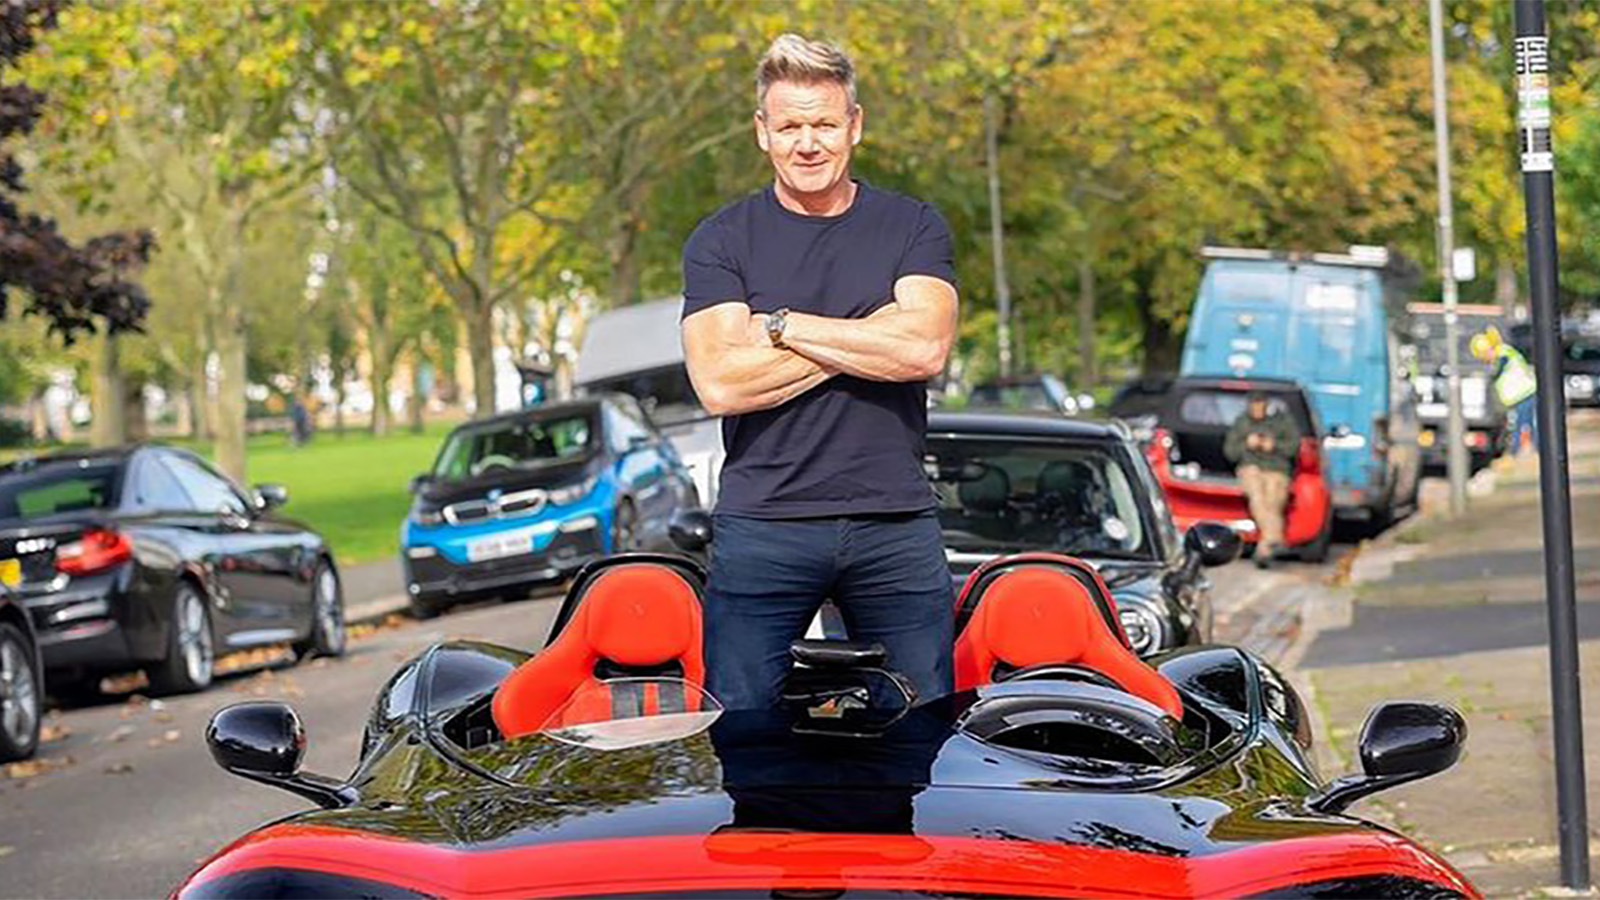 Gordon Ramsay standing in car